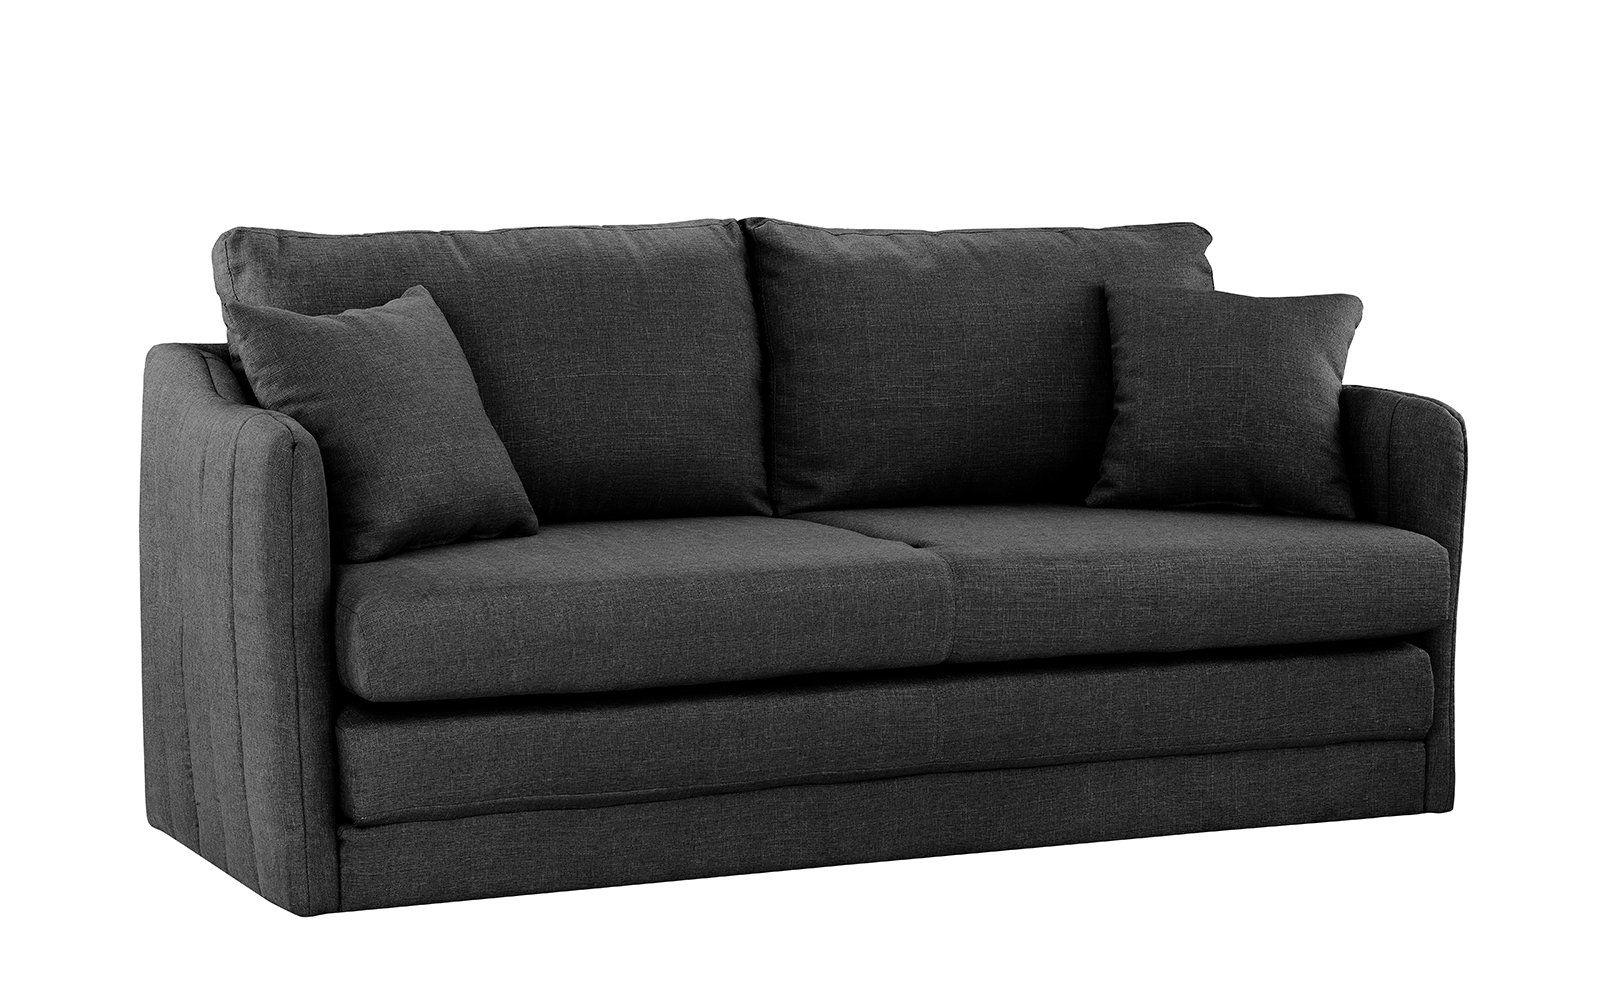 melissa modern soft linen modular sofa lissy s loft pinterest rh pinterest com